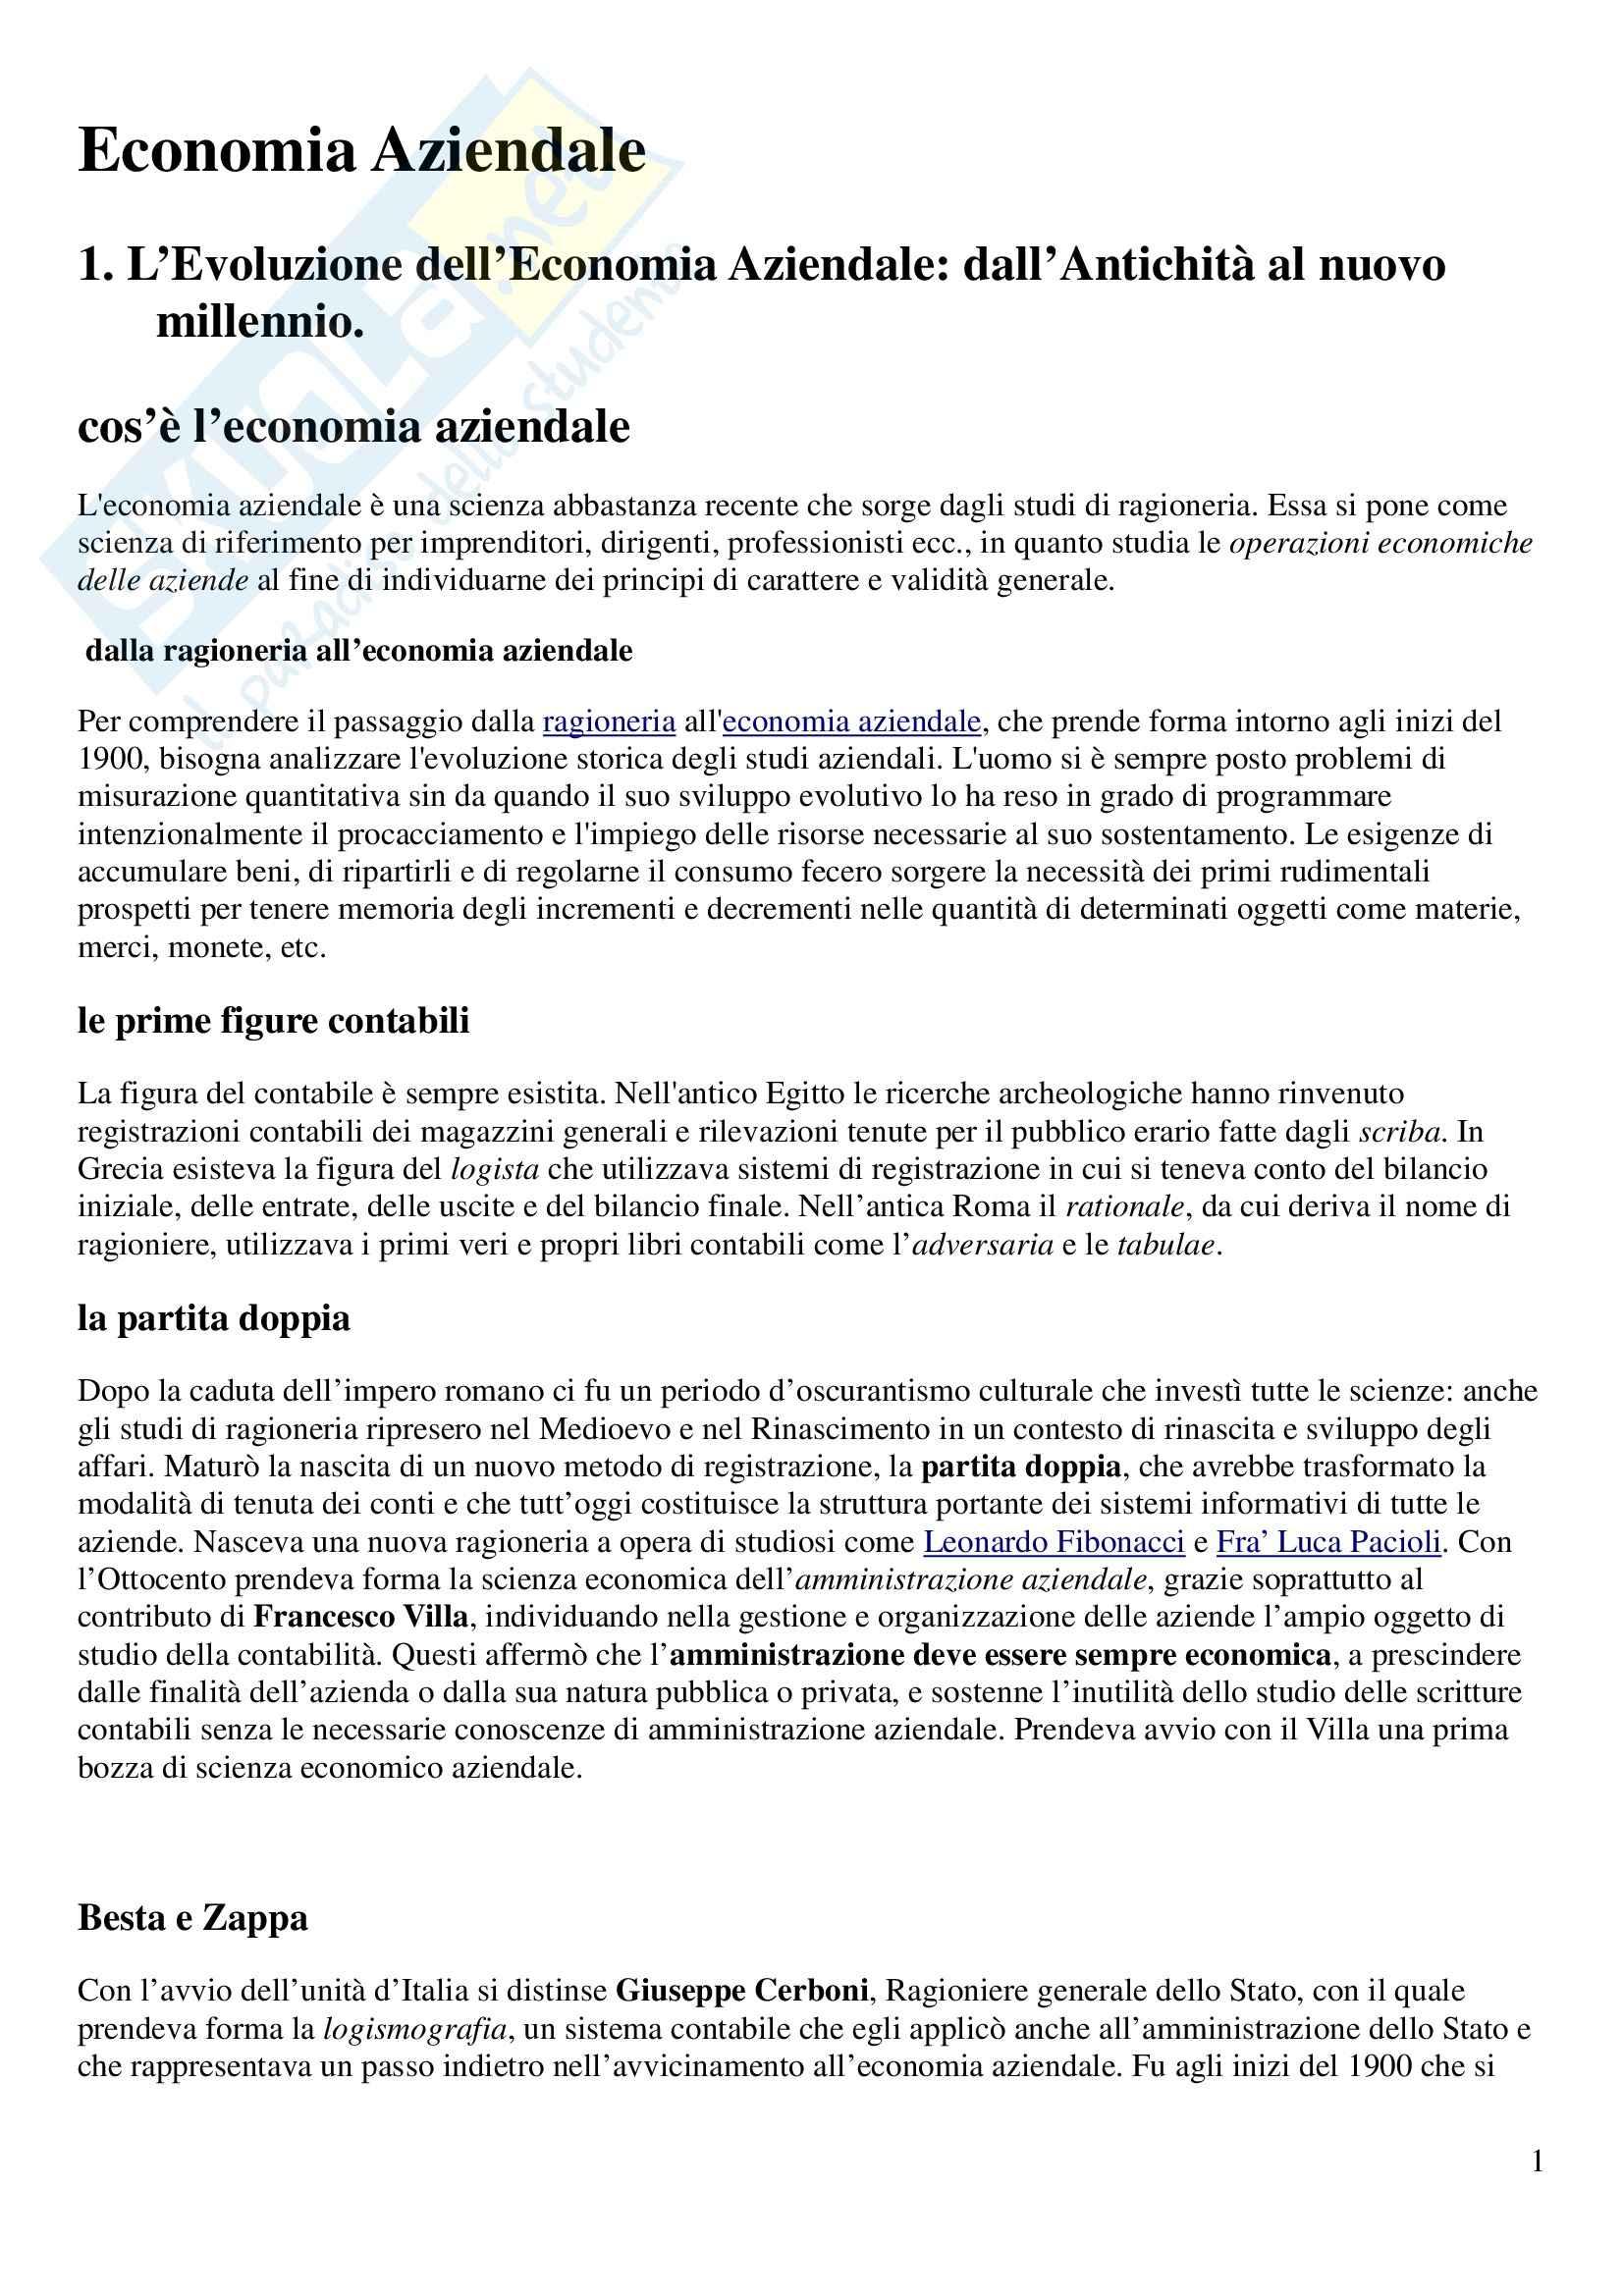 Economia aziendale - Riassunto esame, prof. Scozzese